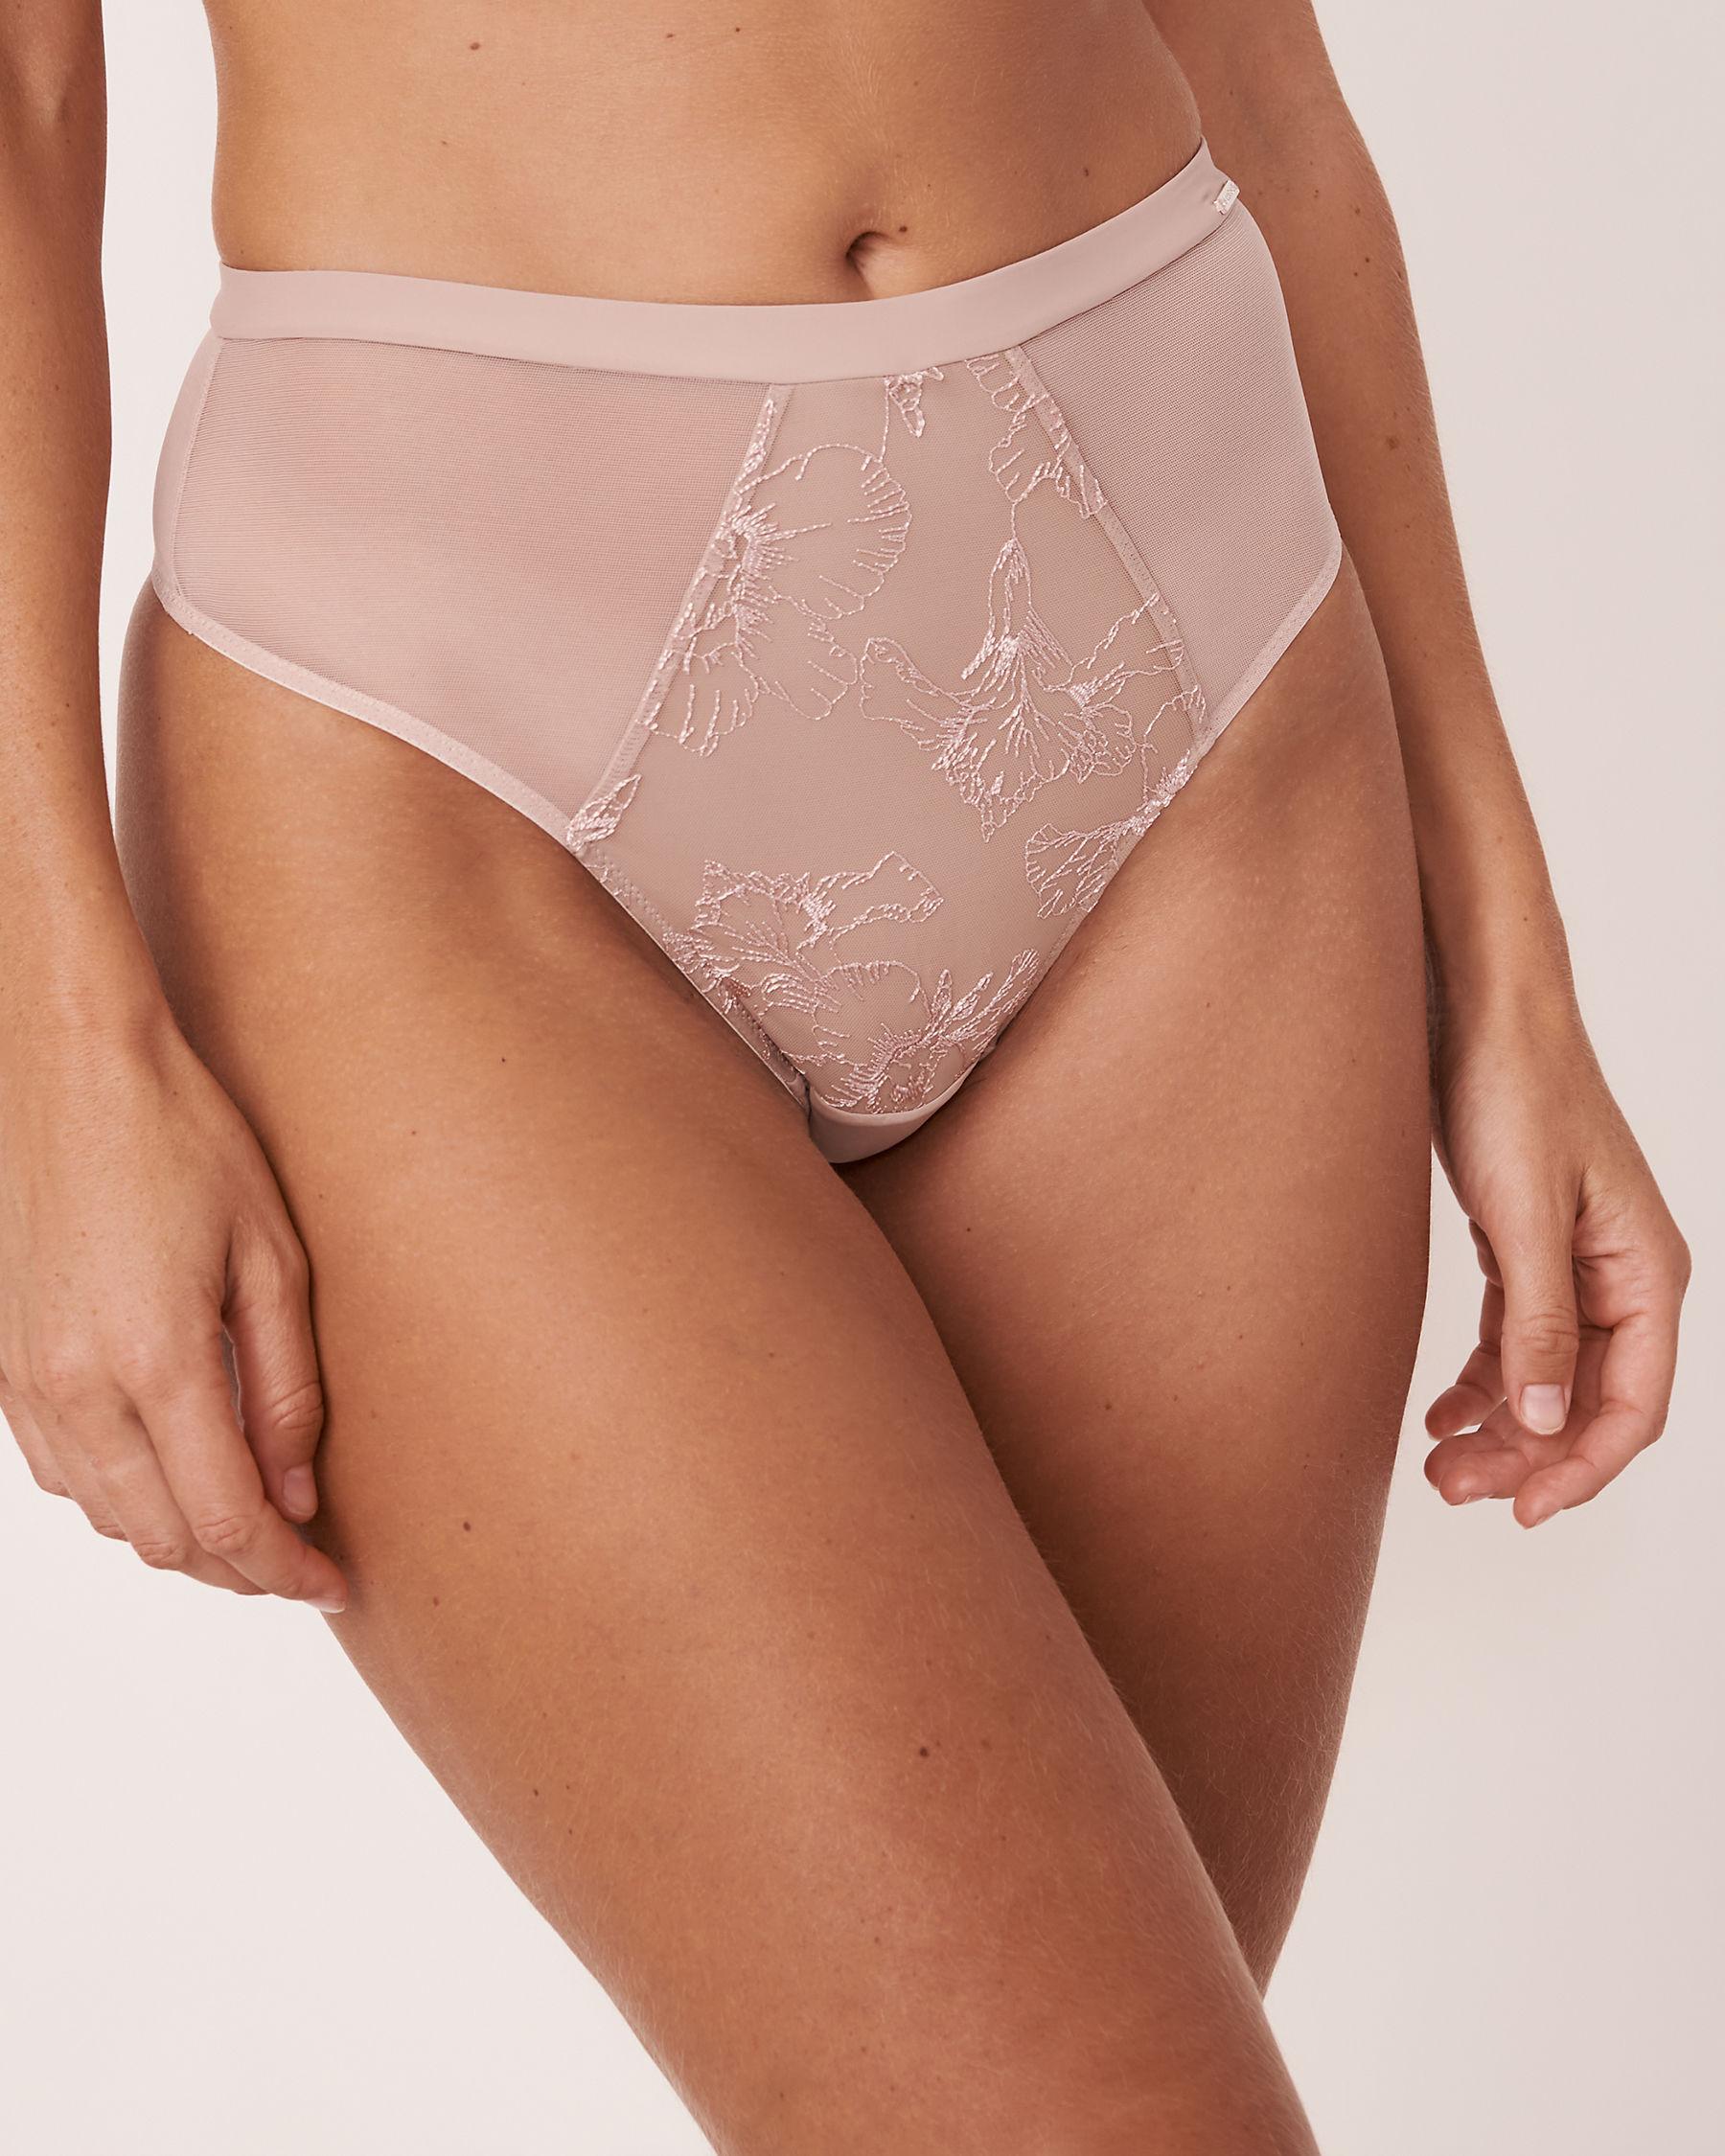 LA VIE EN ROSE High Waist Thong Panty Iris embroidery 20300041 - View1